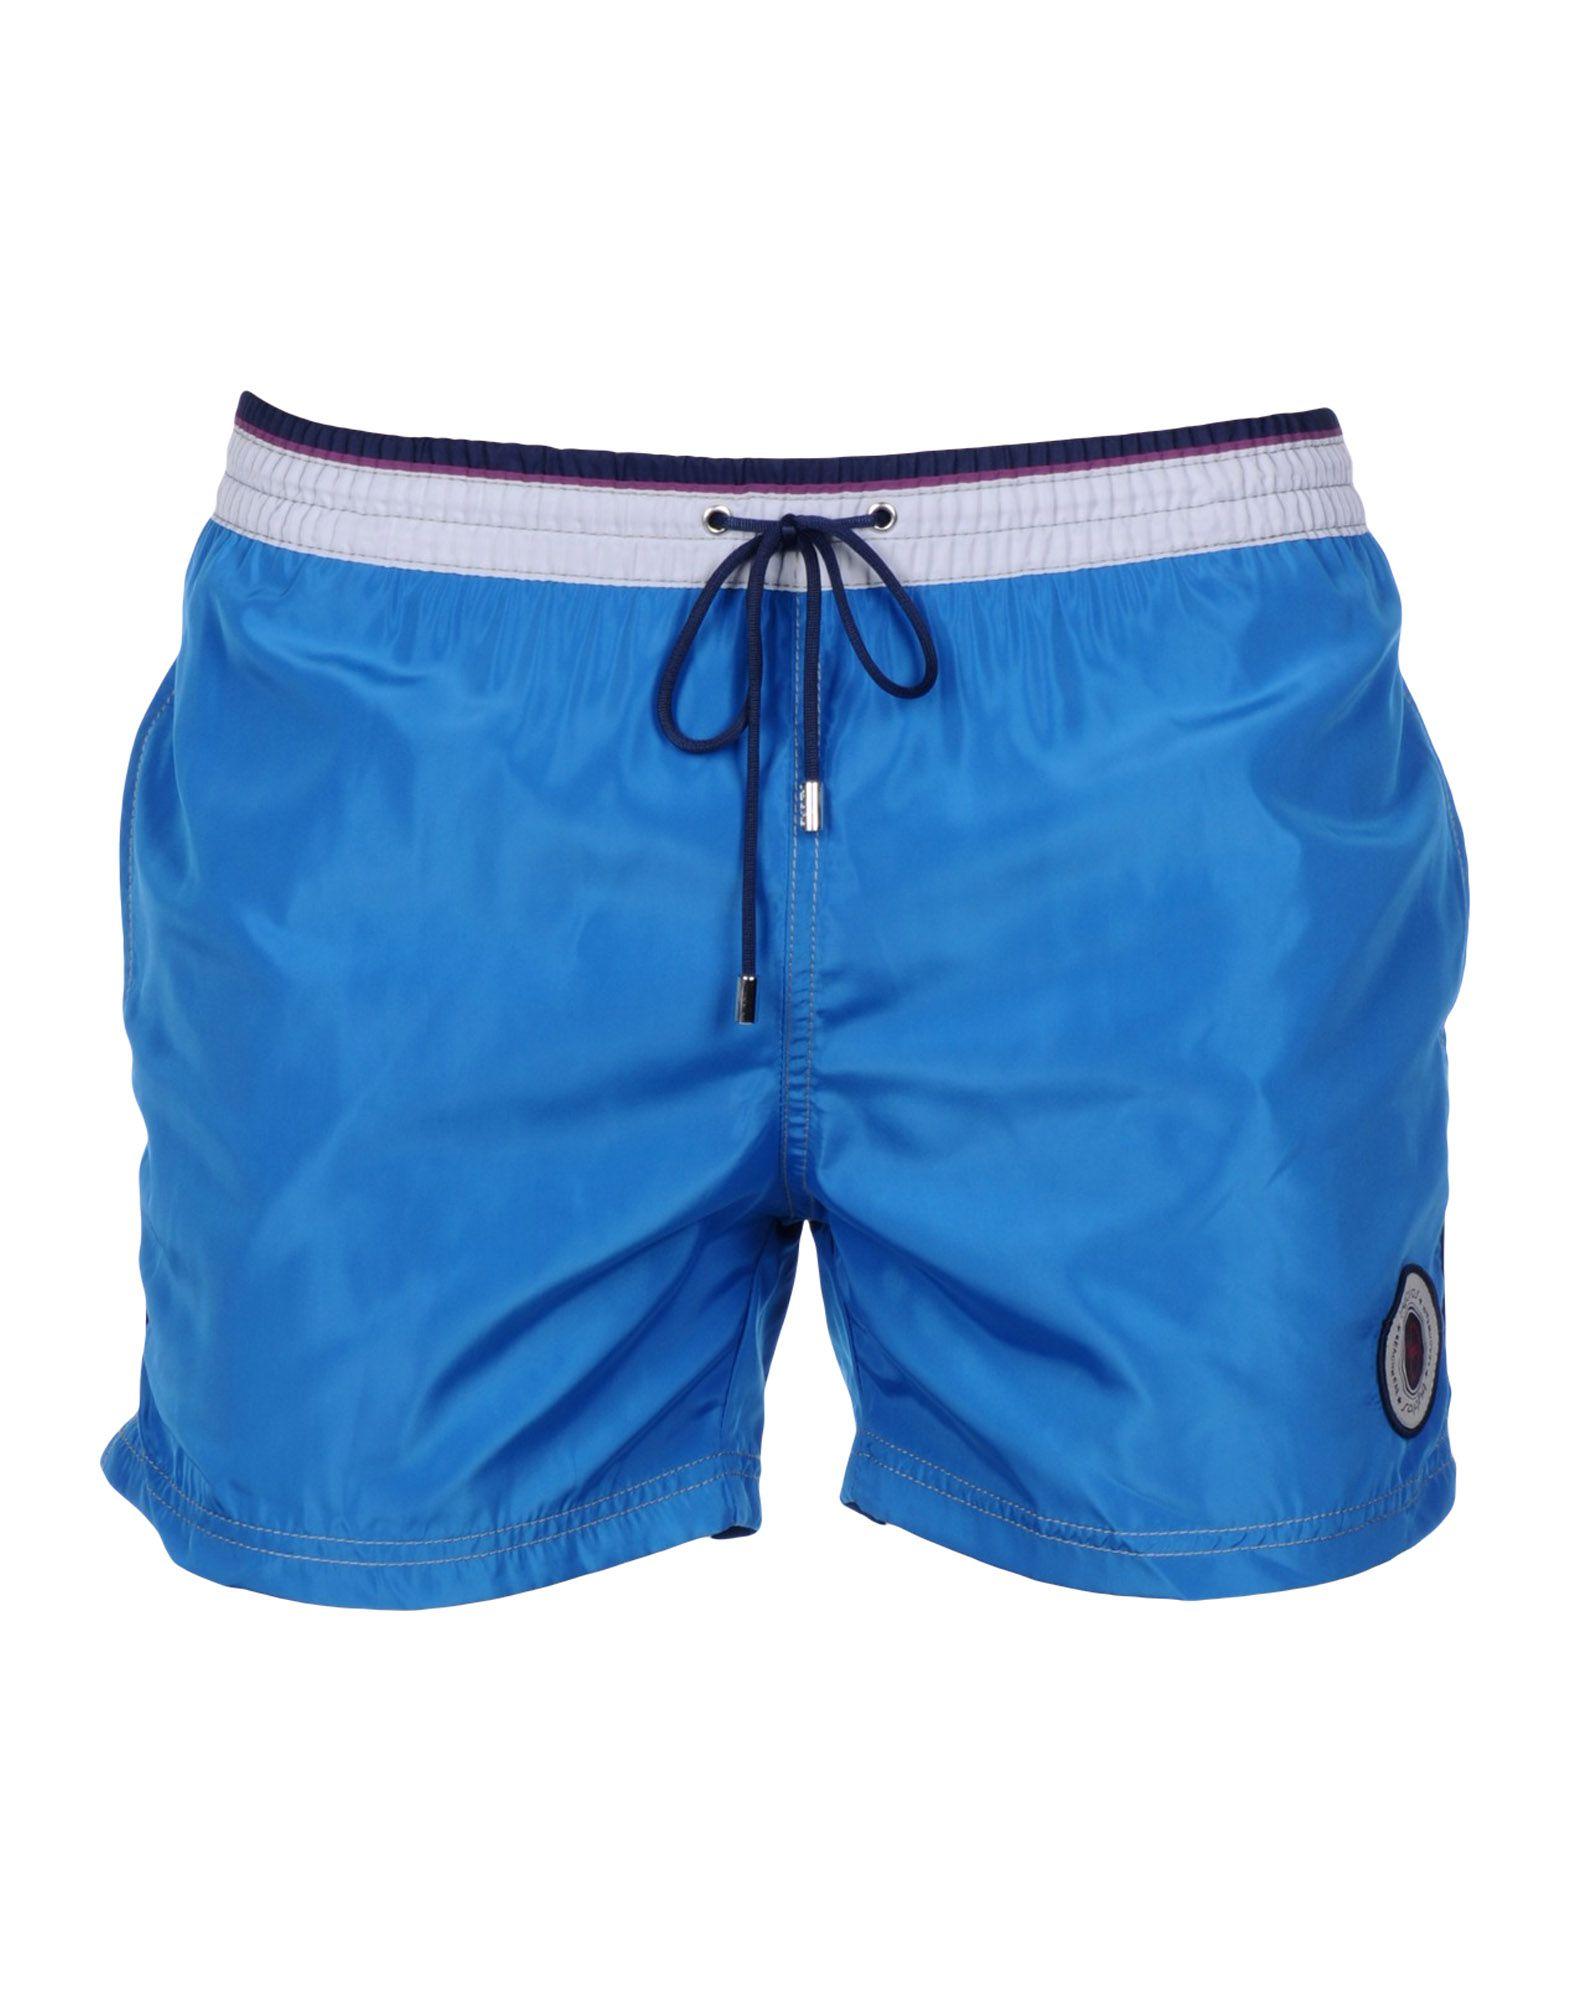 BYBLOS BEACHWEAR Swim trunks